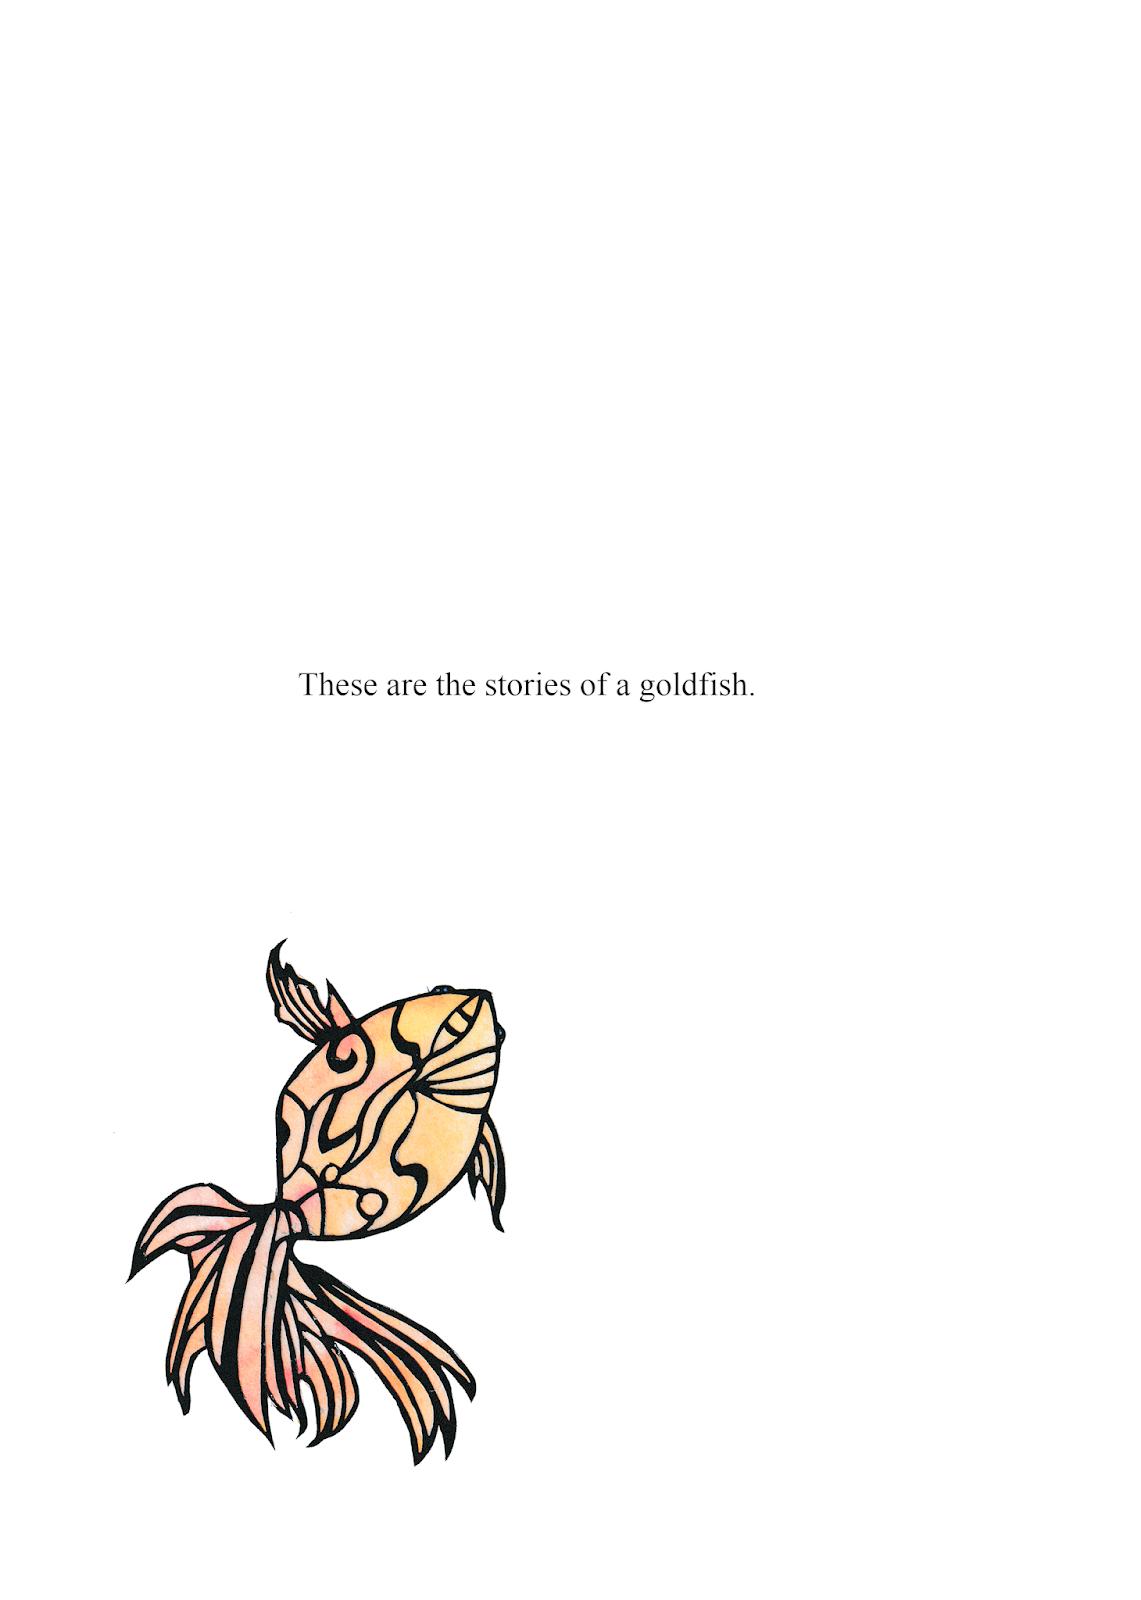 'Ten Dreams of the Goldfish'